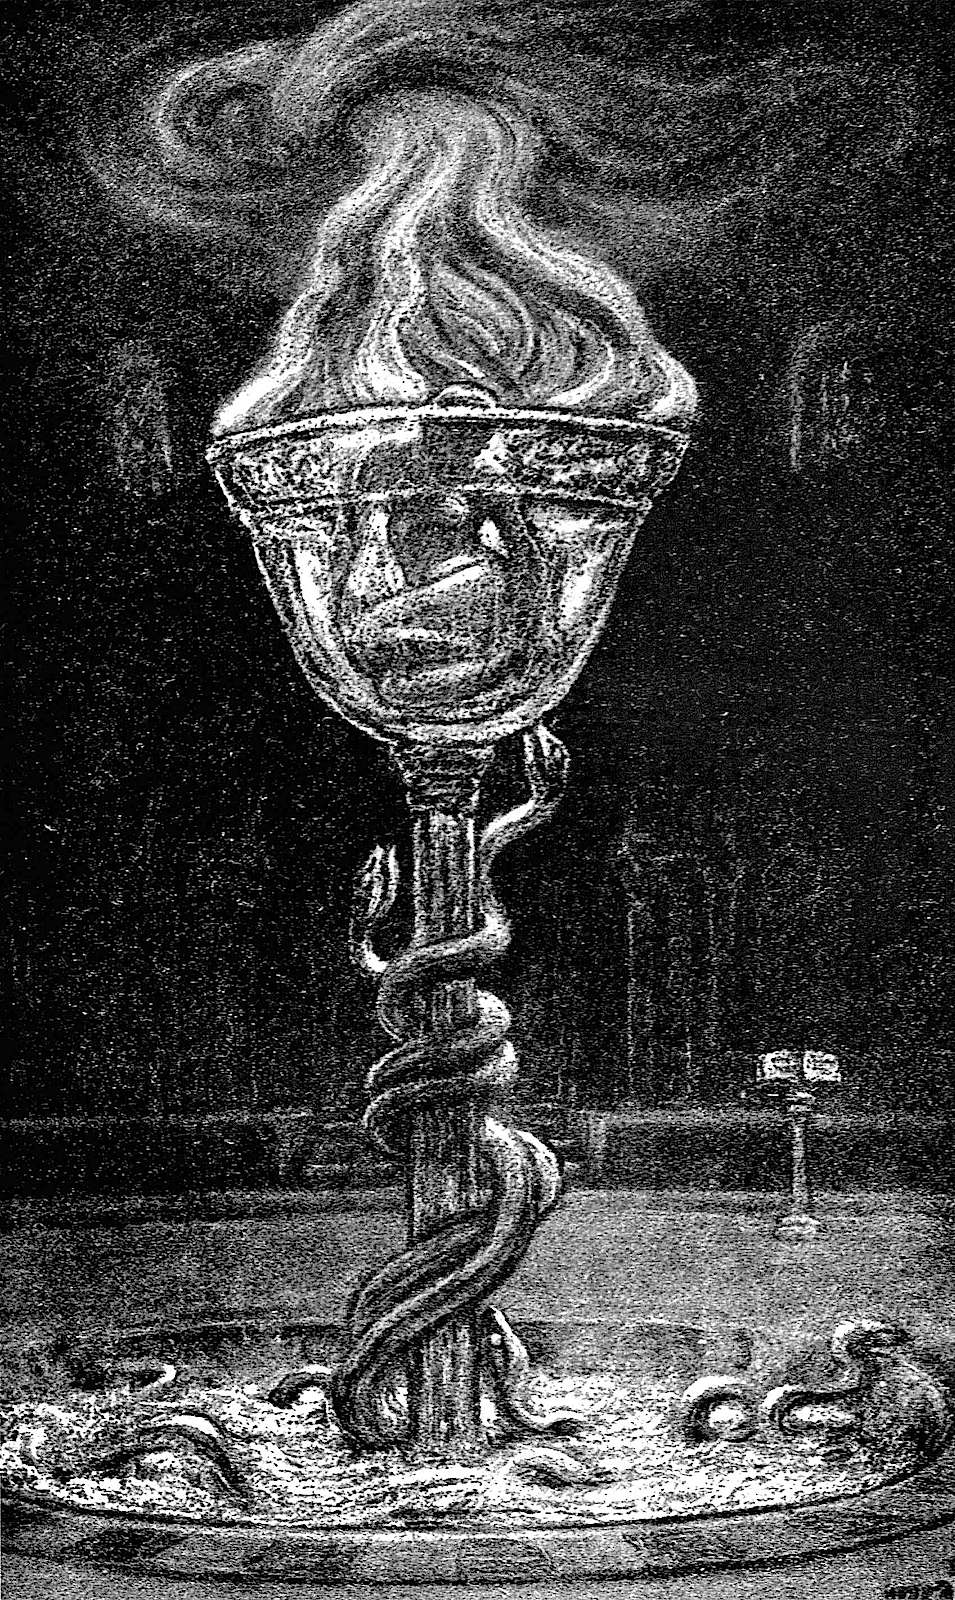 Elihu Vedder art, poison in a glass